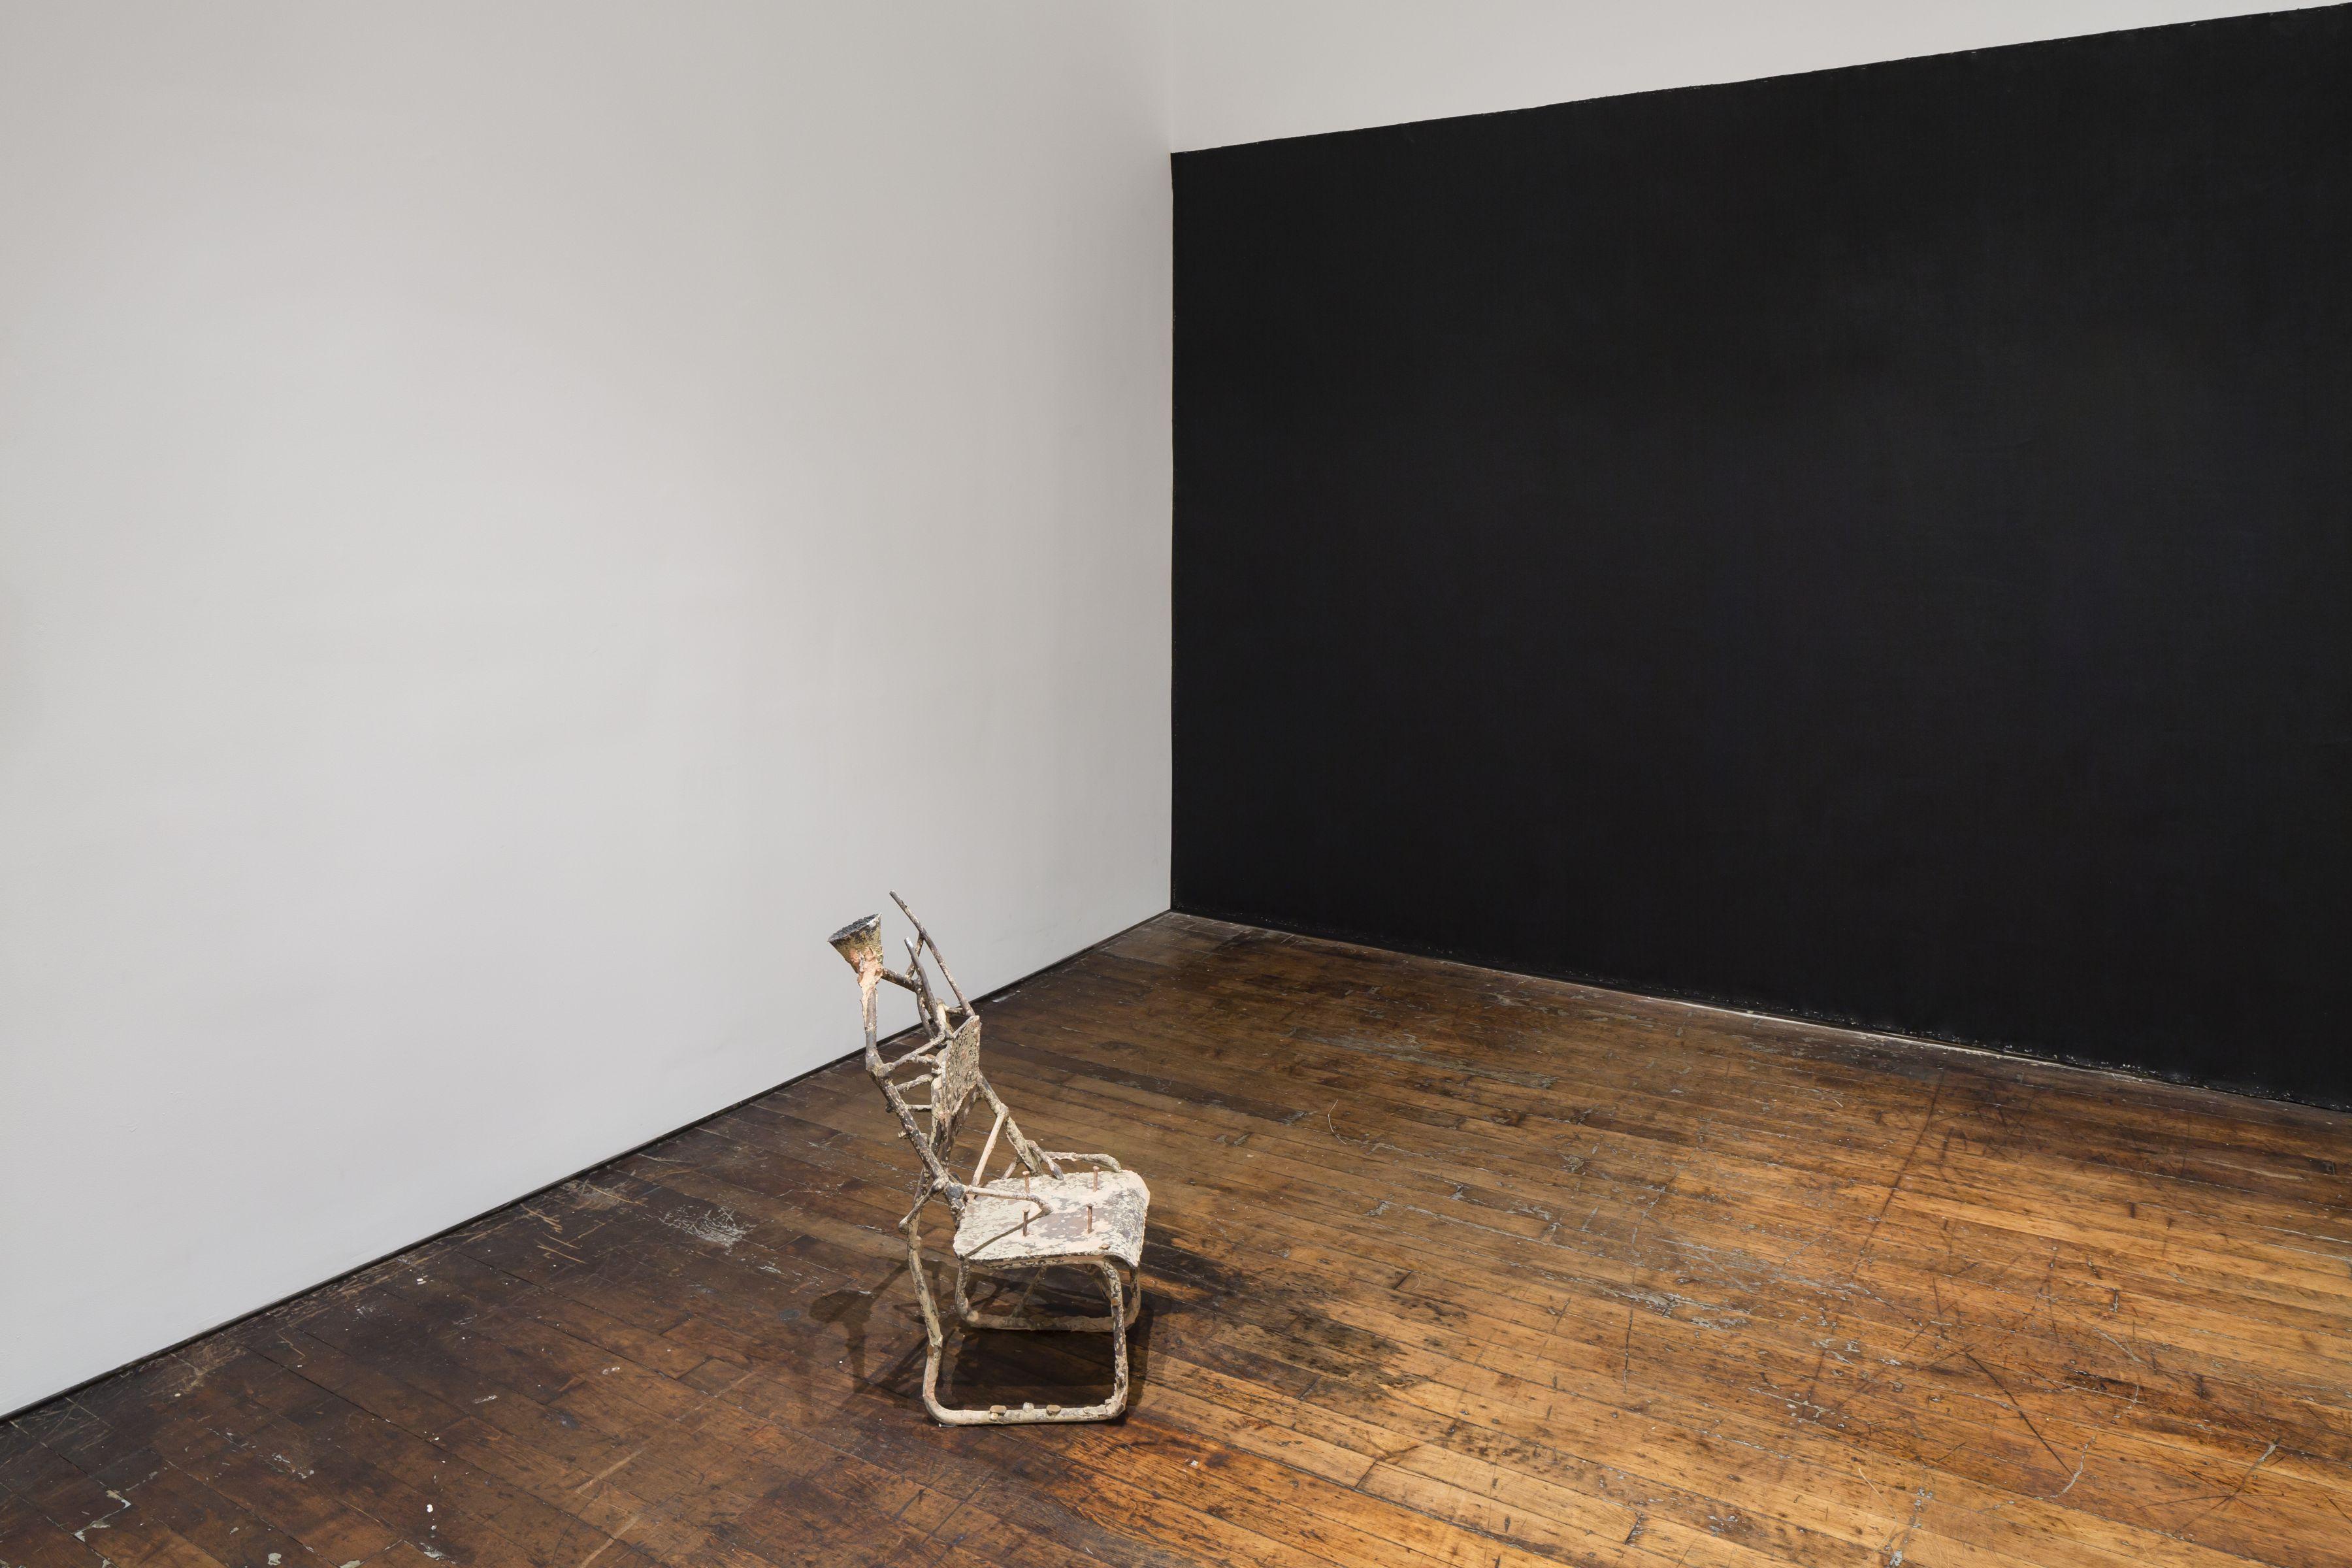 Untitled: Benassi, Bochner, Cabrita Reis, Gober, Nauman, Serra, Sosnowska, Tuttle, Walther– installation view 4